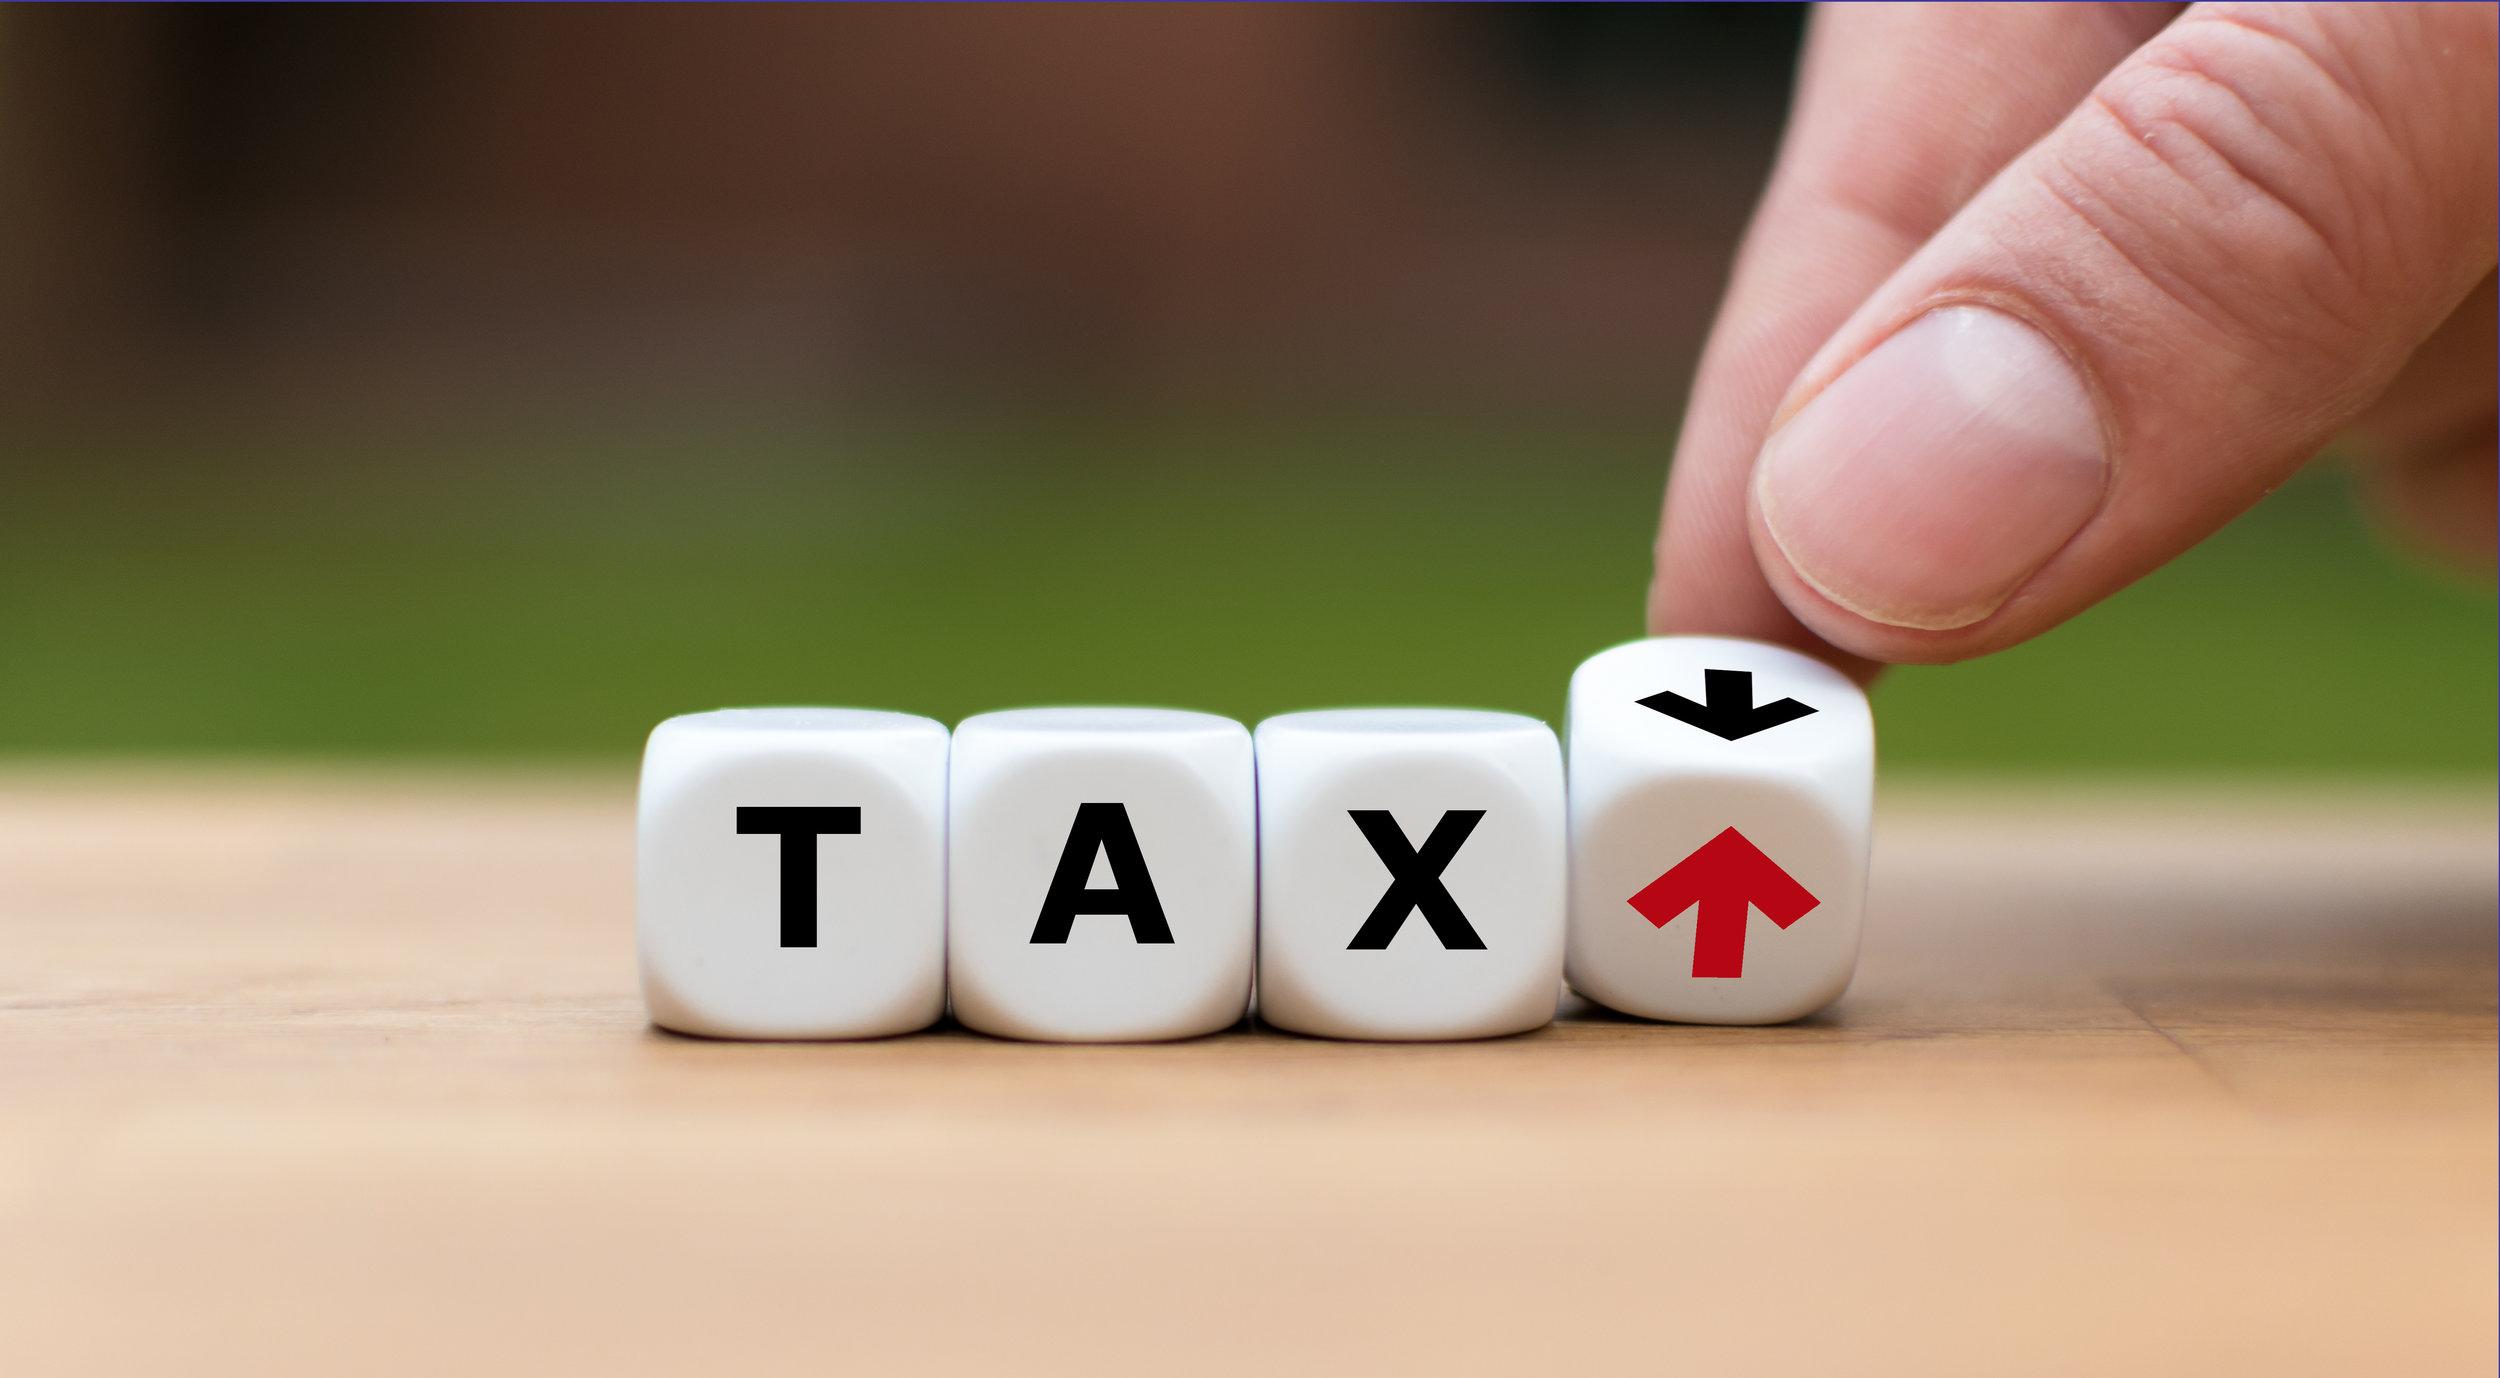 Tax Change AdobeStock_239587170.jpeg